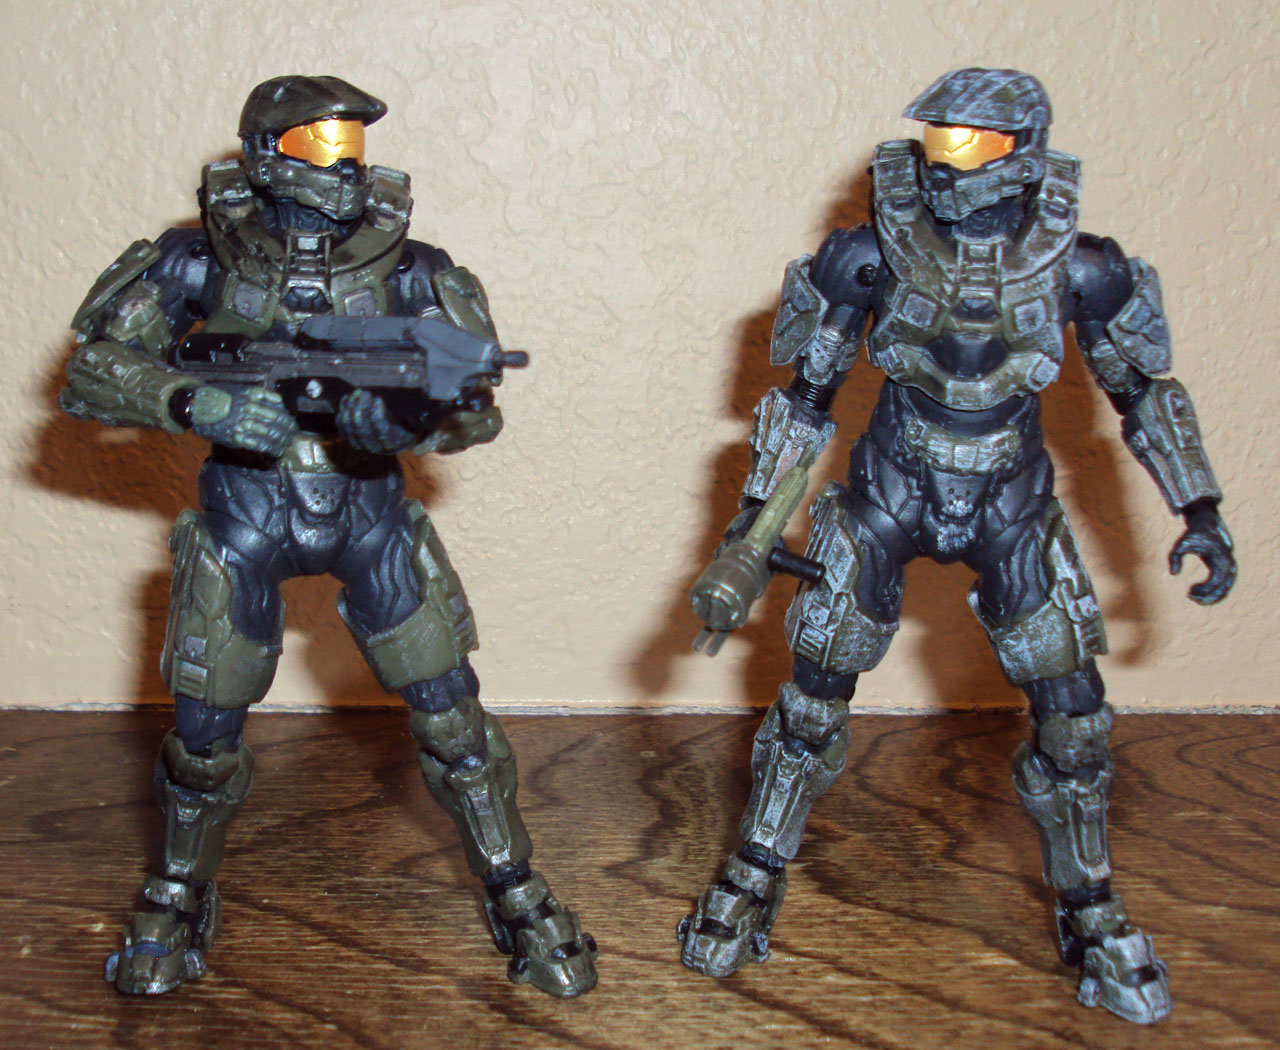 Mcfarlane Toys Halo 4 Cryotube